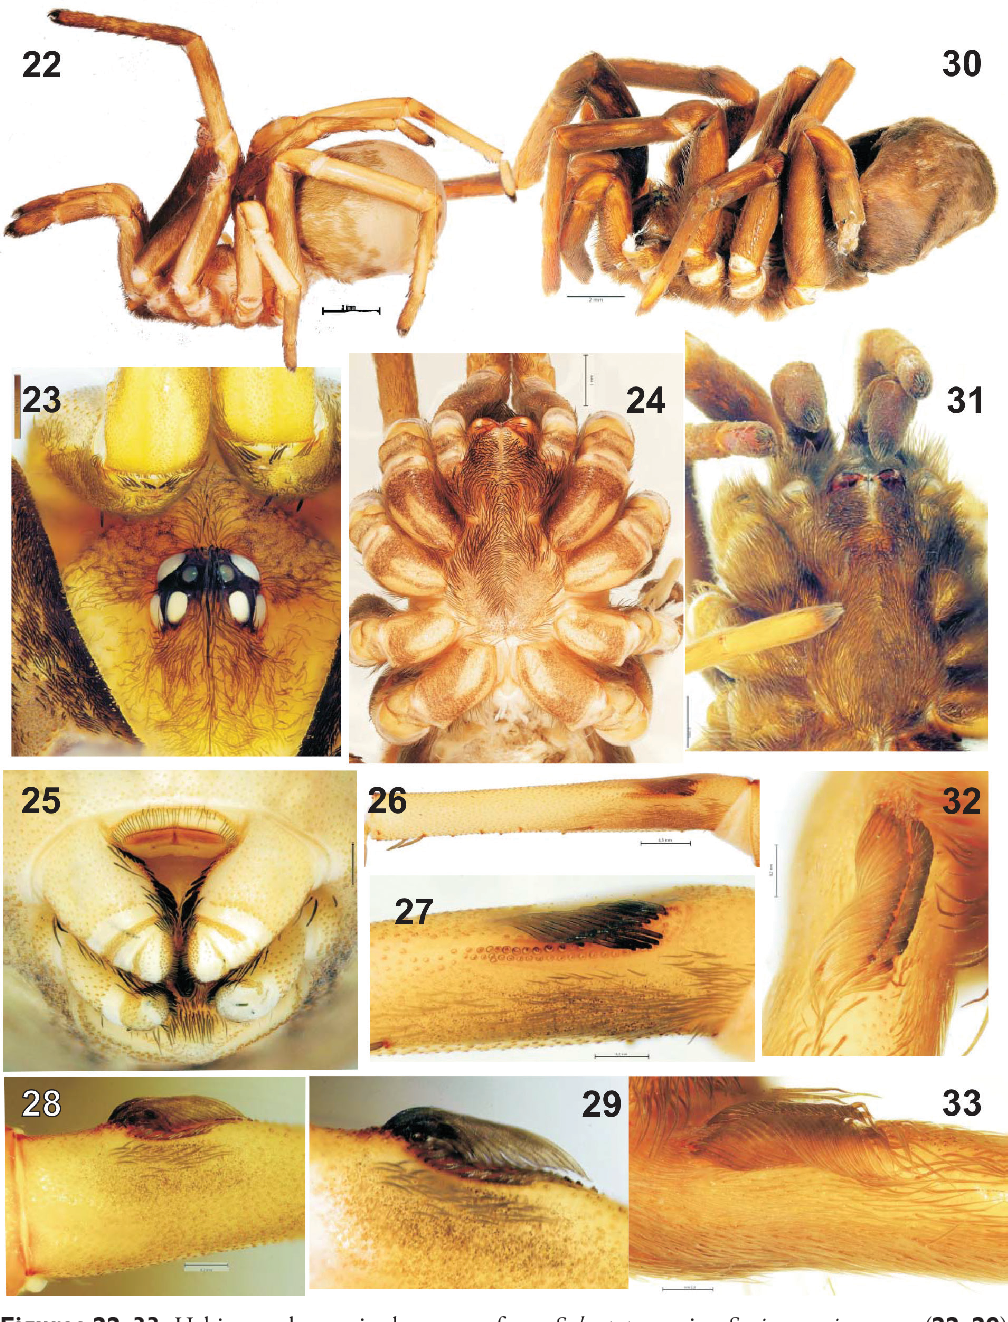 figure 22–33